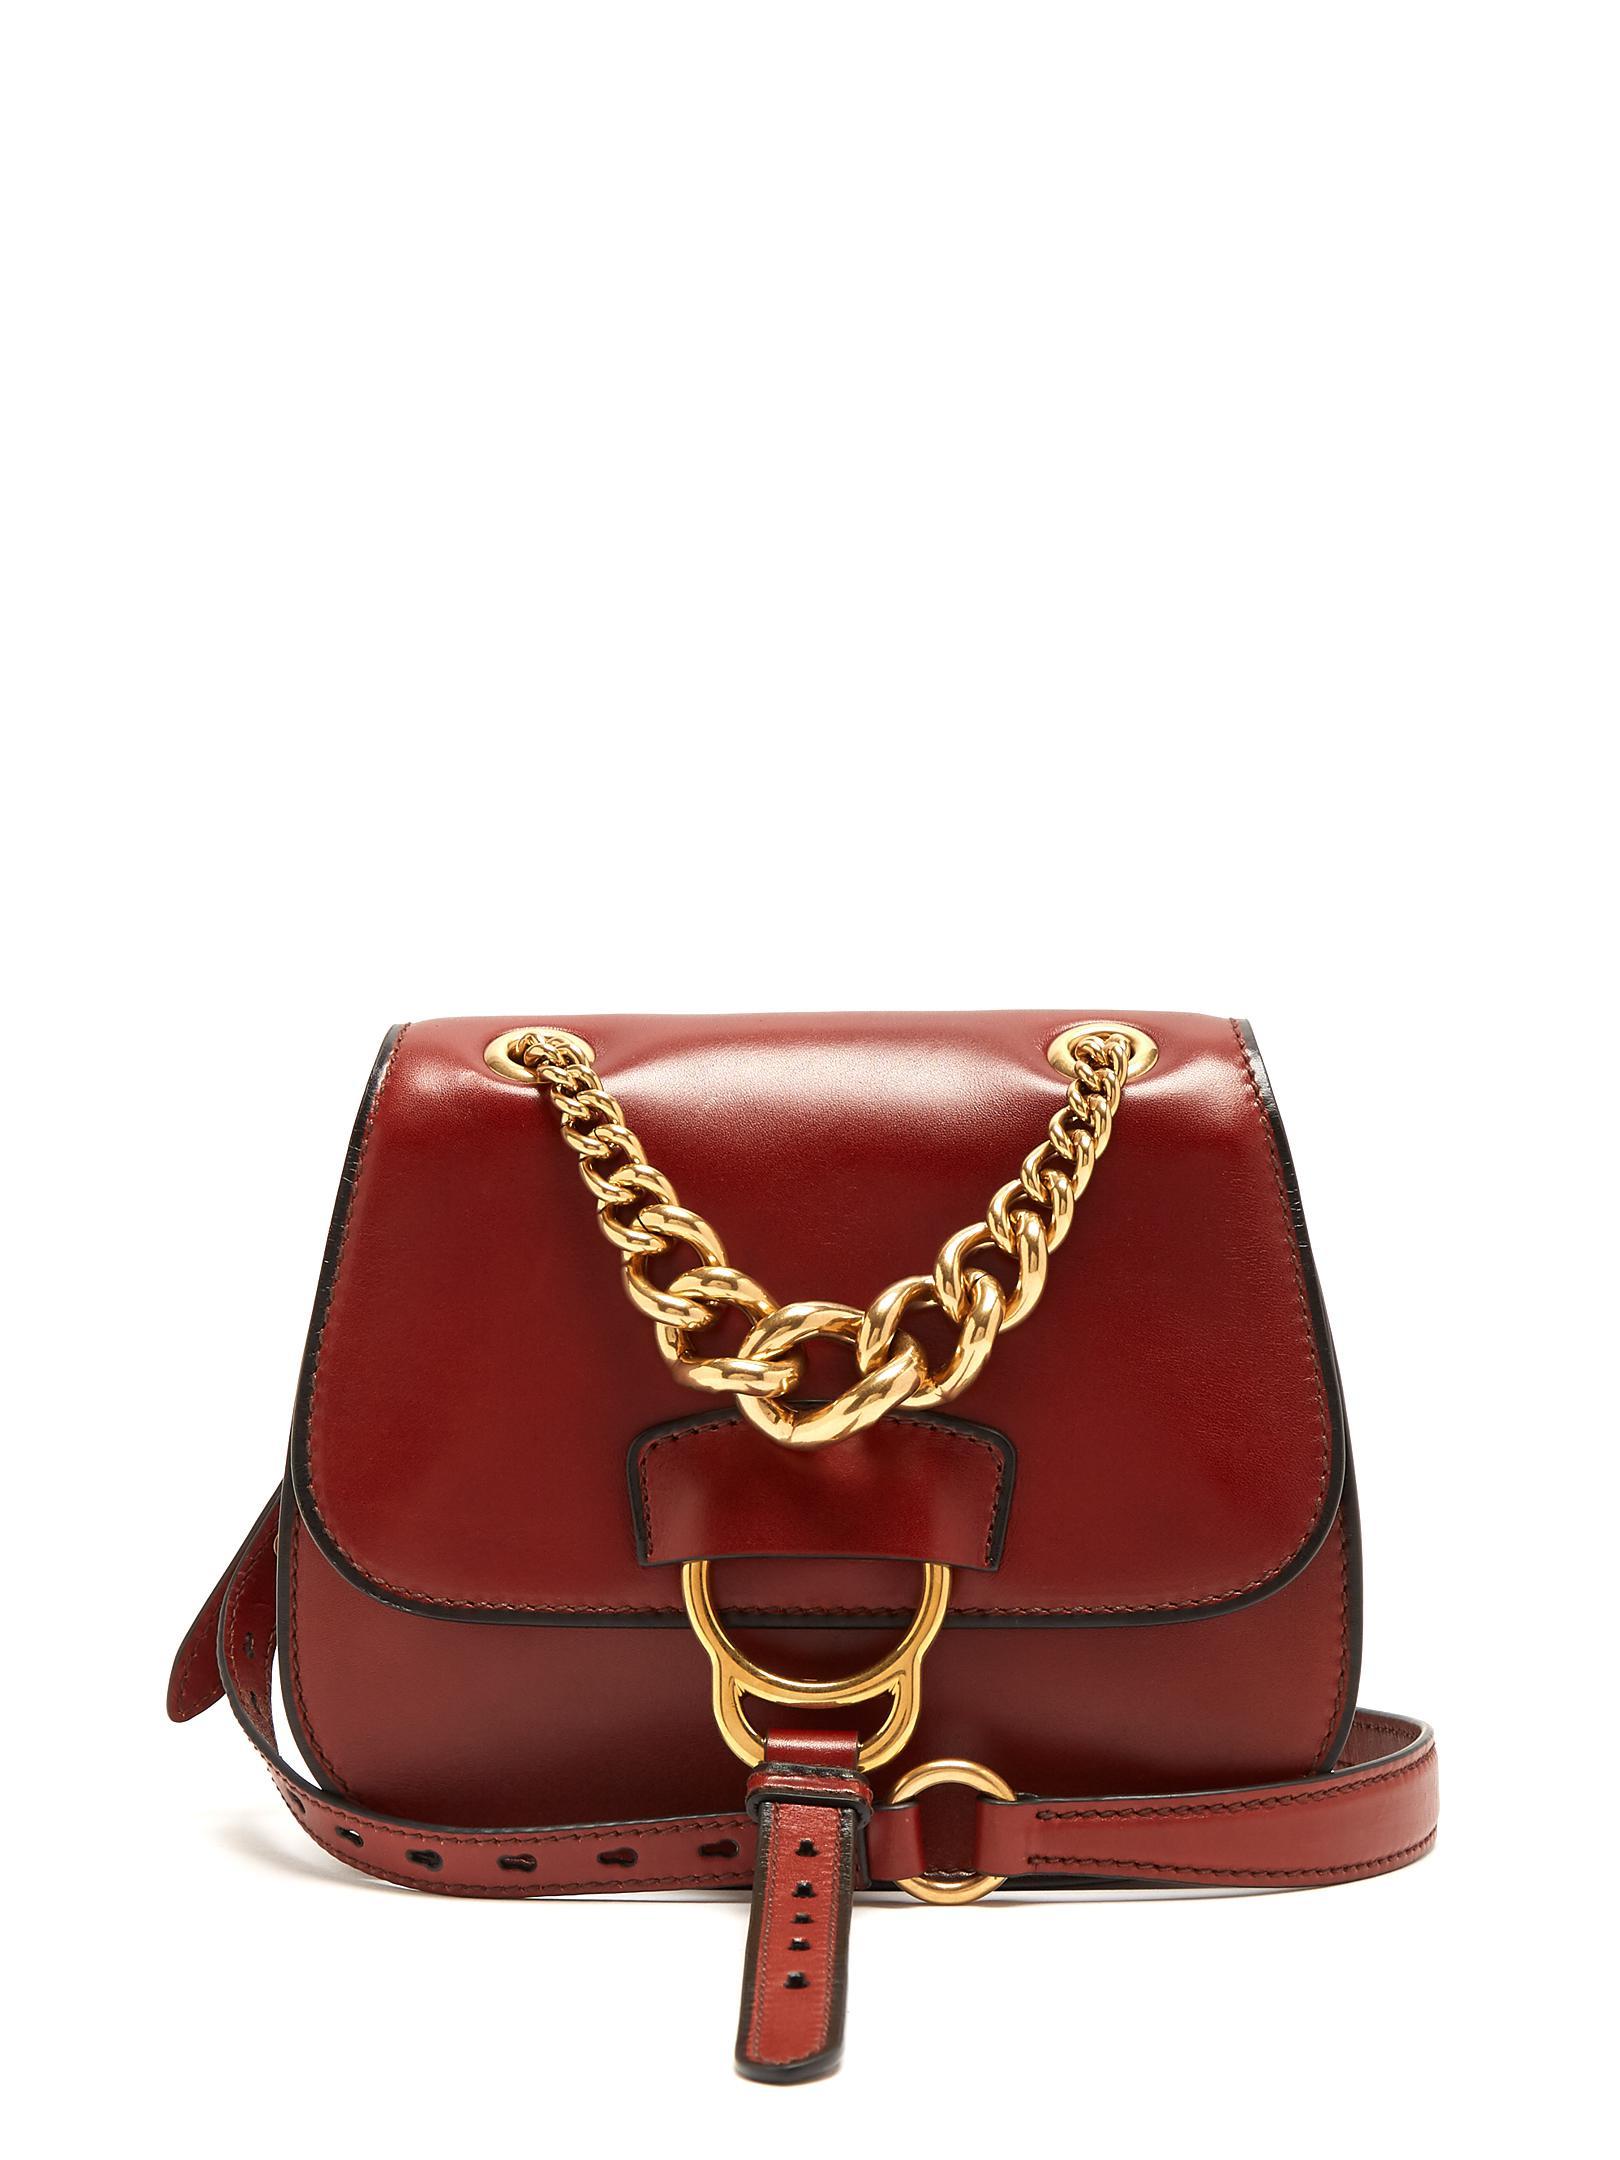 1826b9dec7ad Lyst - Miu Miu Dahlia Leather Cross-body Bag